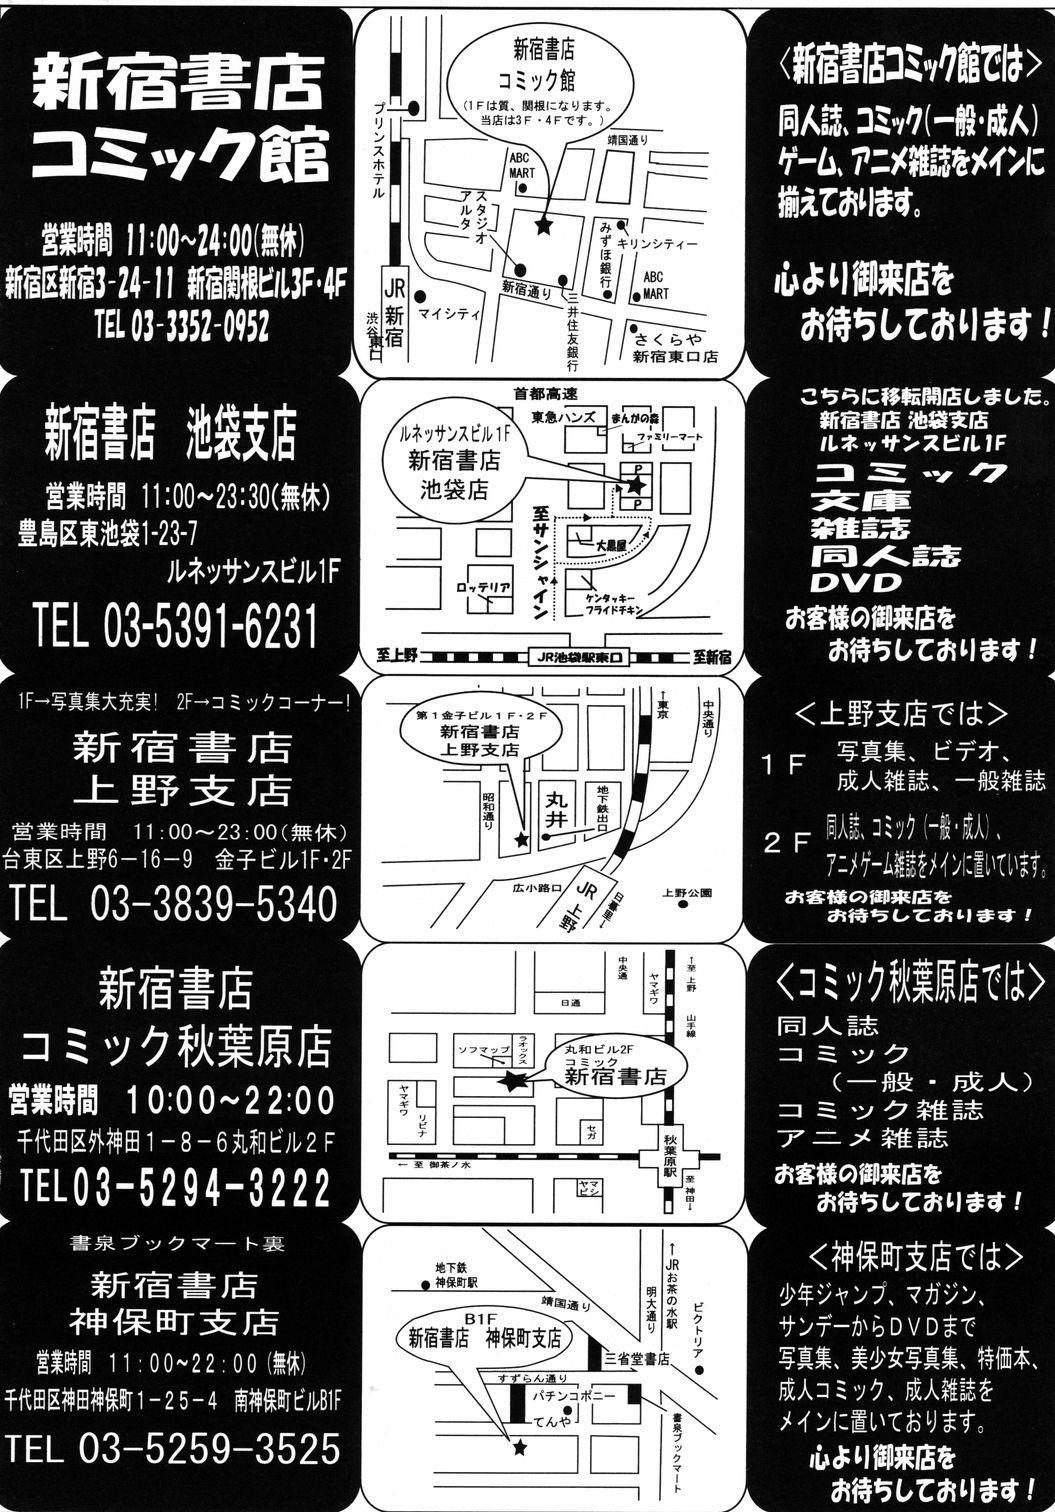 COMIC Megastore 2010-10 440